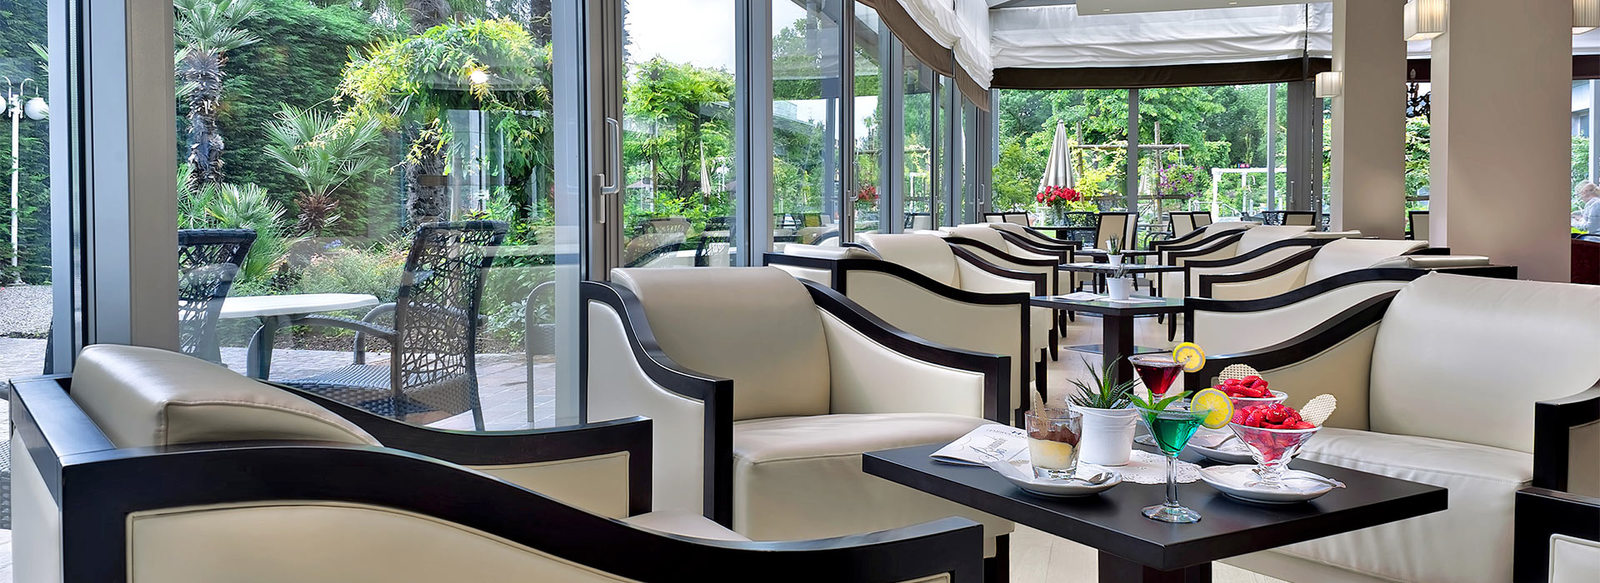 Abano Terme Sauna Bagno Turco.Miglior Prezzo Hotel Harry S Garden Abano Terme Veneto